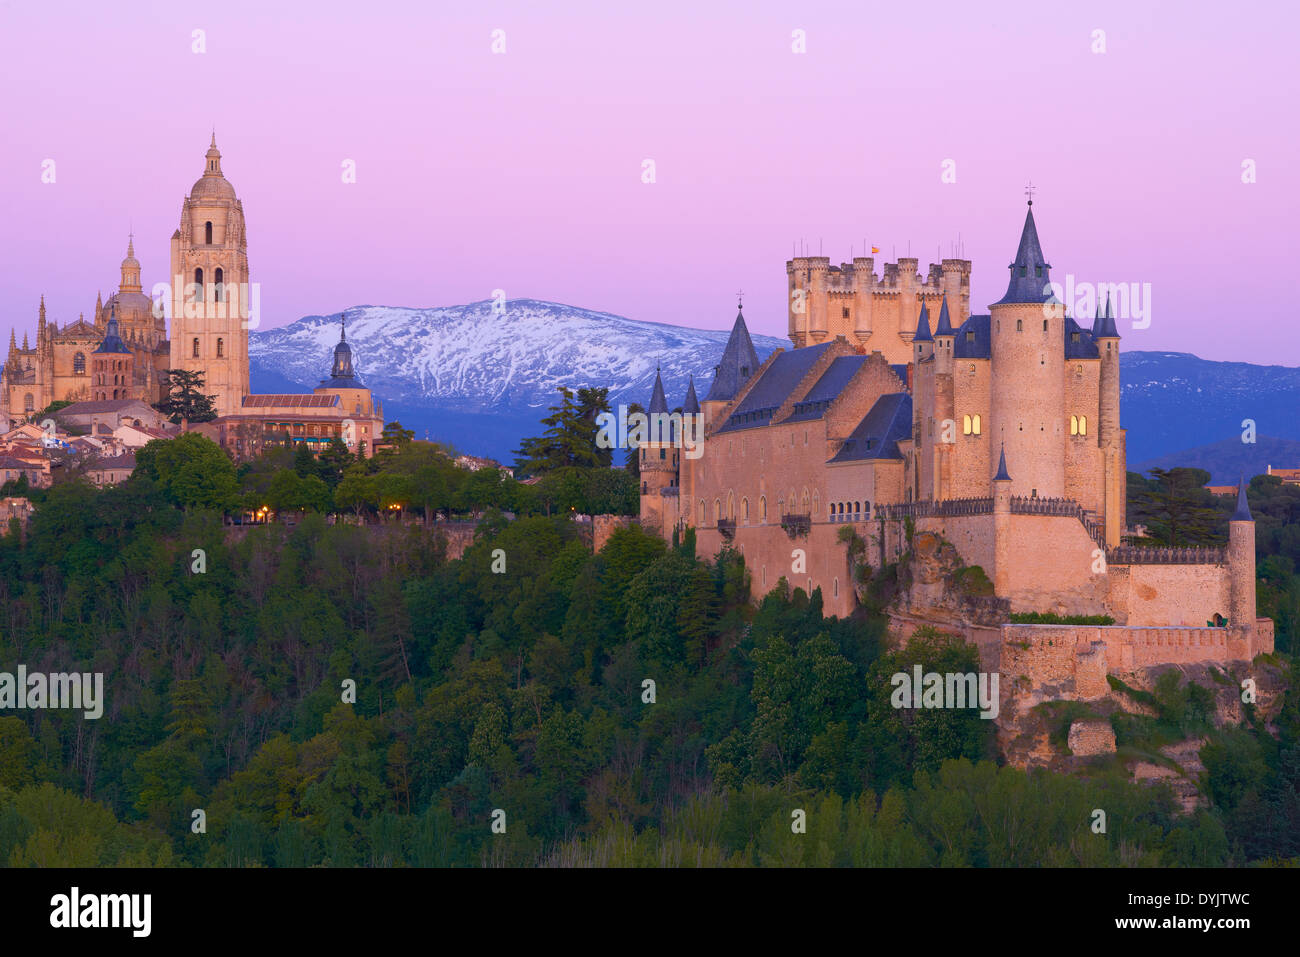 Alcazar, Cathedral, Segovia, Alcazar fortress and Cathedral at Sunset, Castilla-León, Spain. Alcazar von Segovia ist eine Burg i - Stock Image